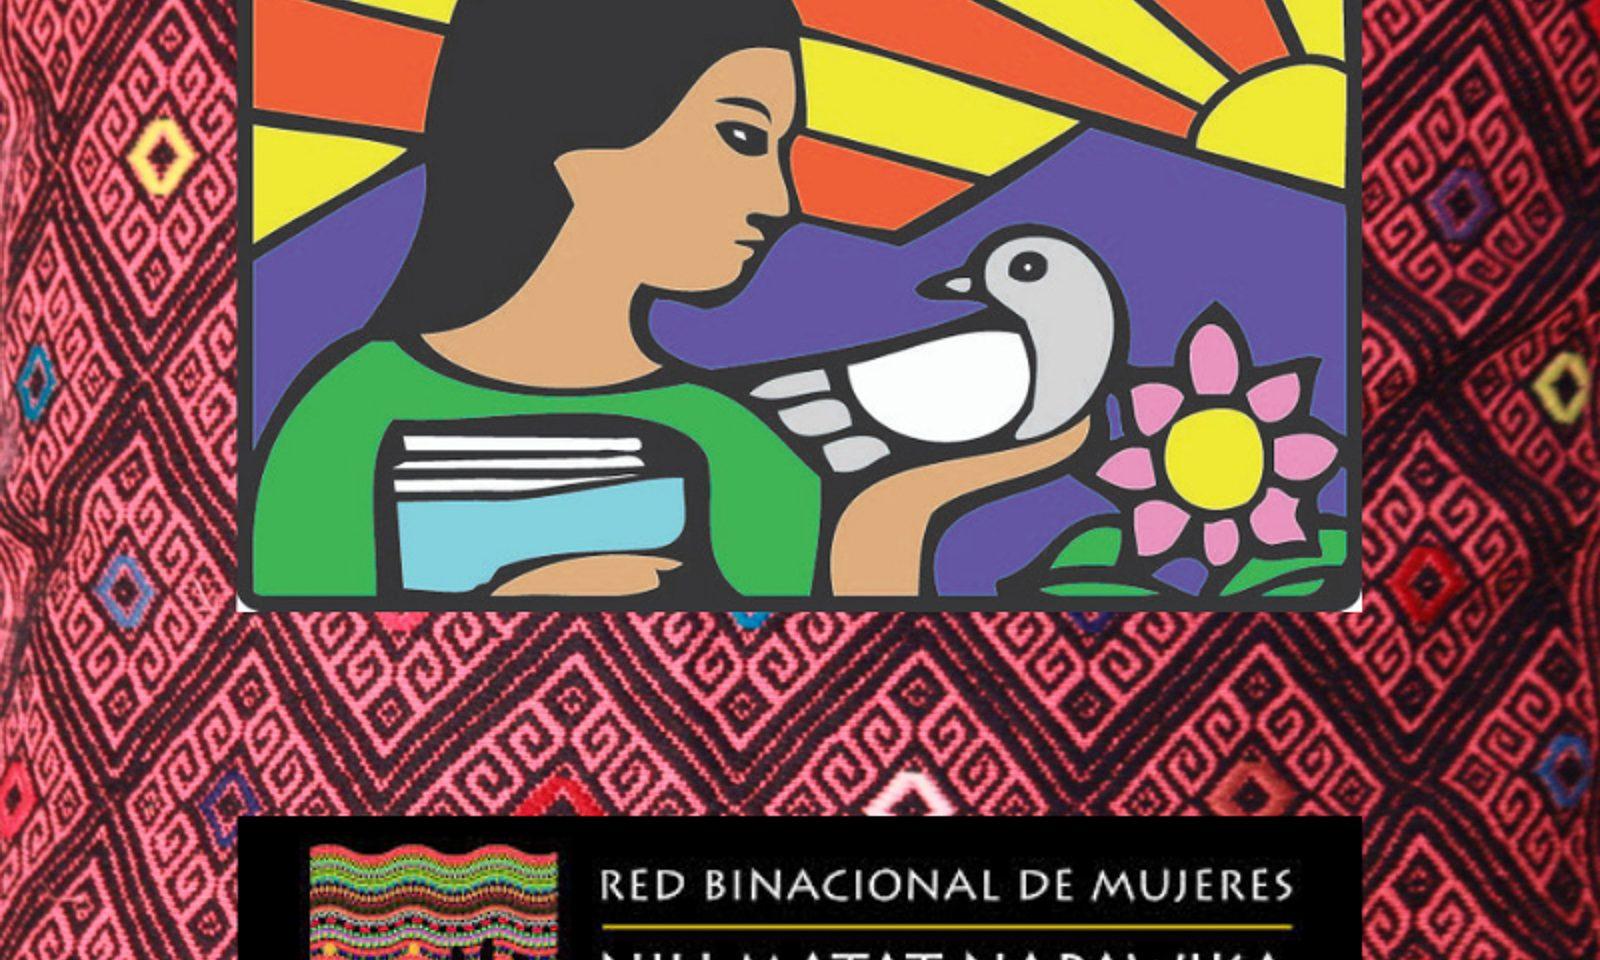 La Mujer Obrera, 2018 NALAC Fund for the Arts Grantee